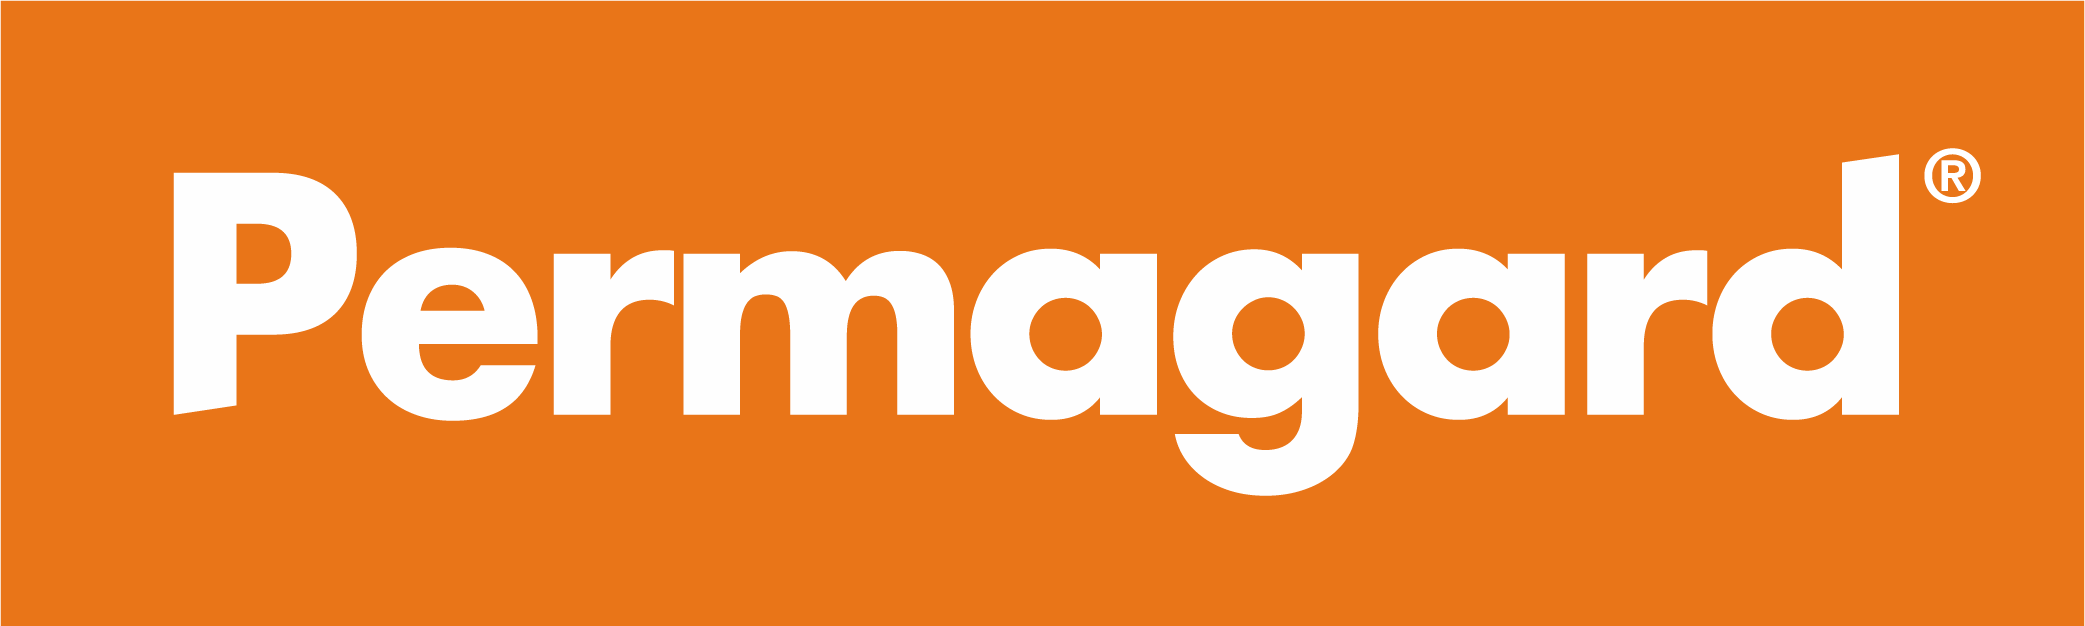 PG-PPC_Logo.png